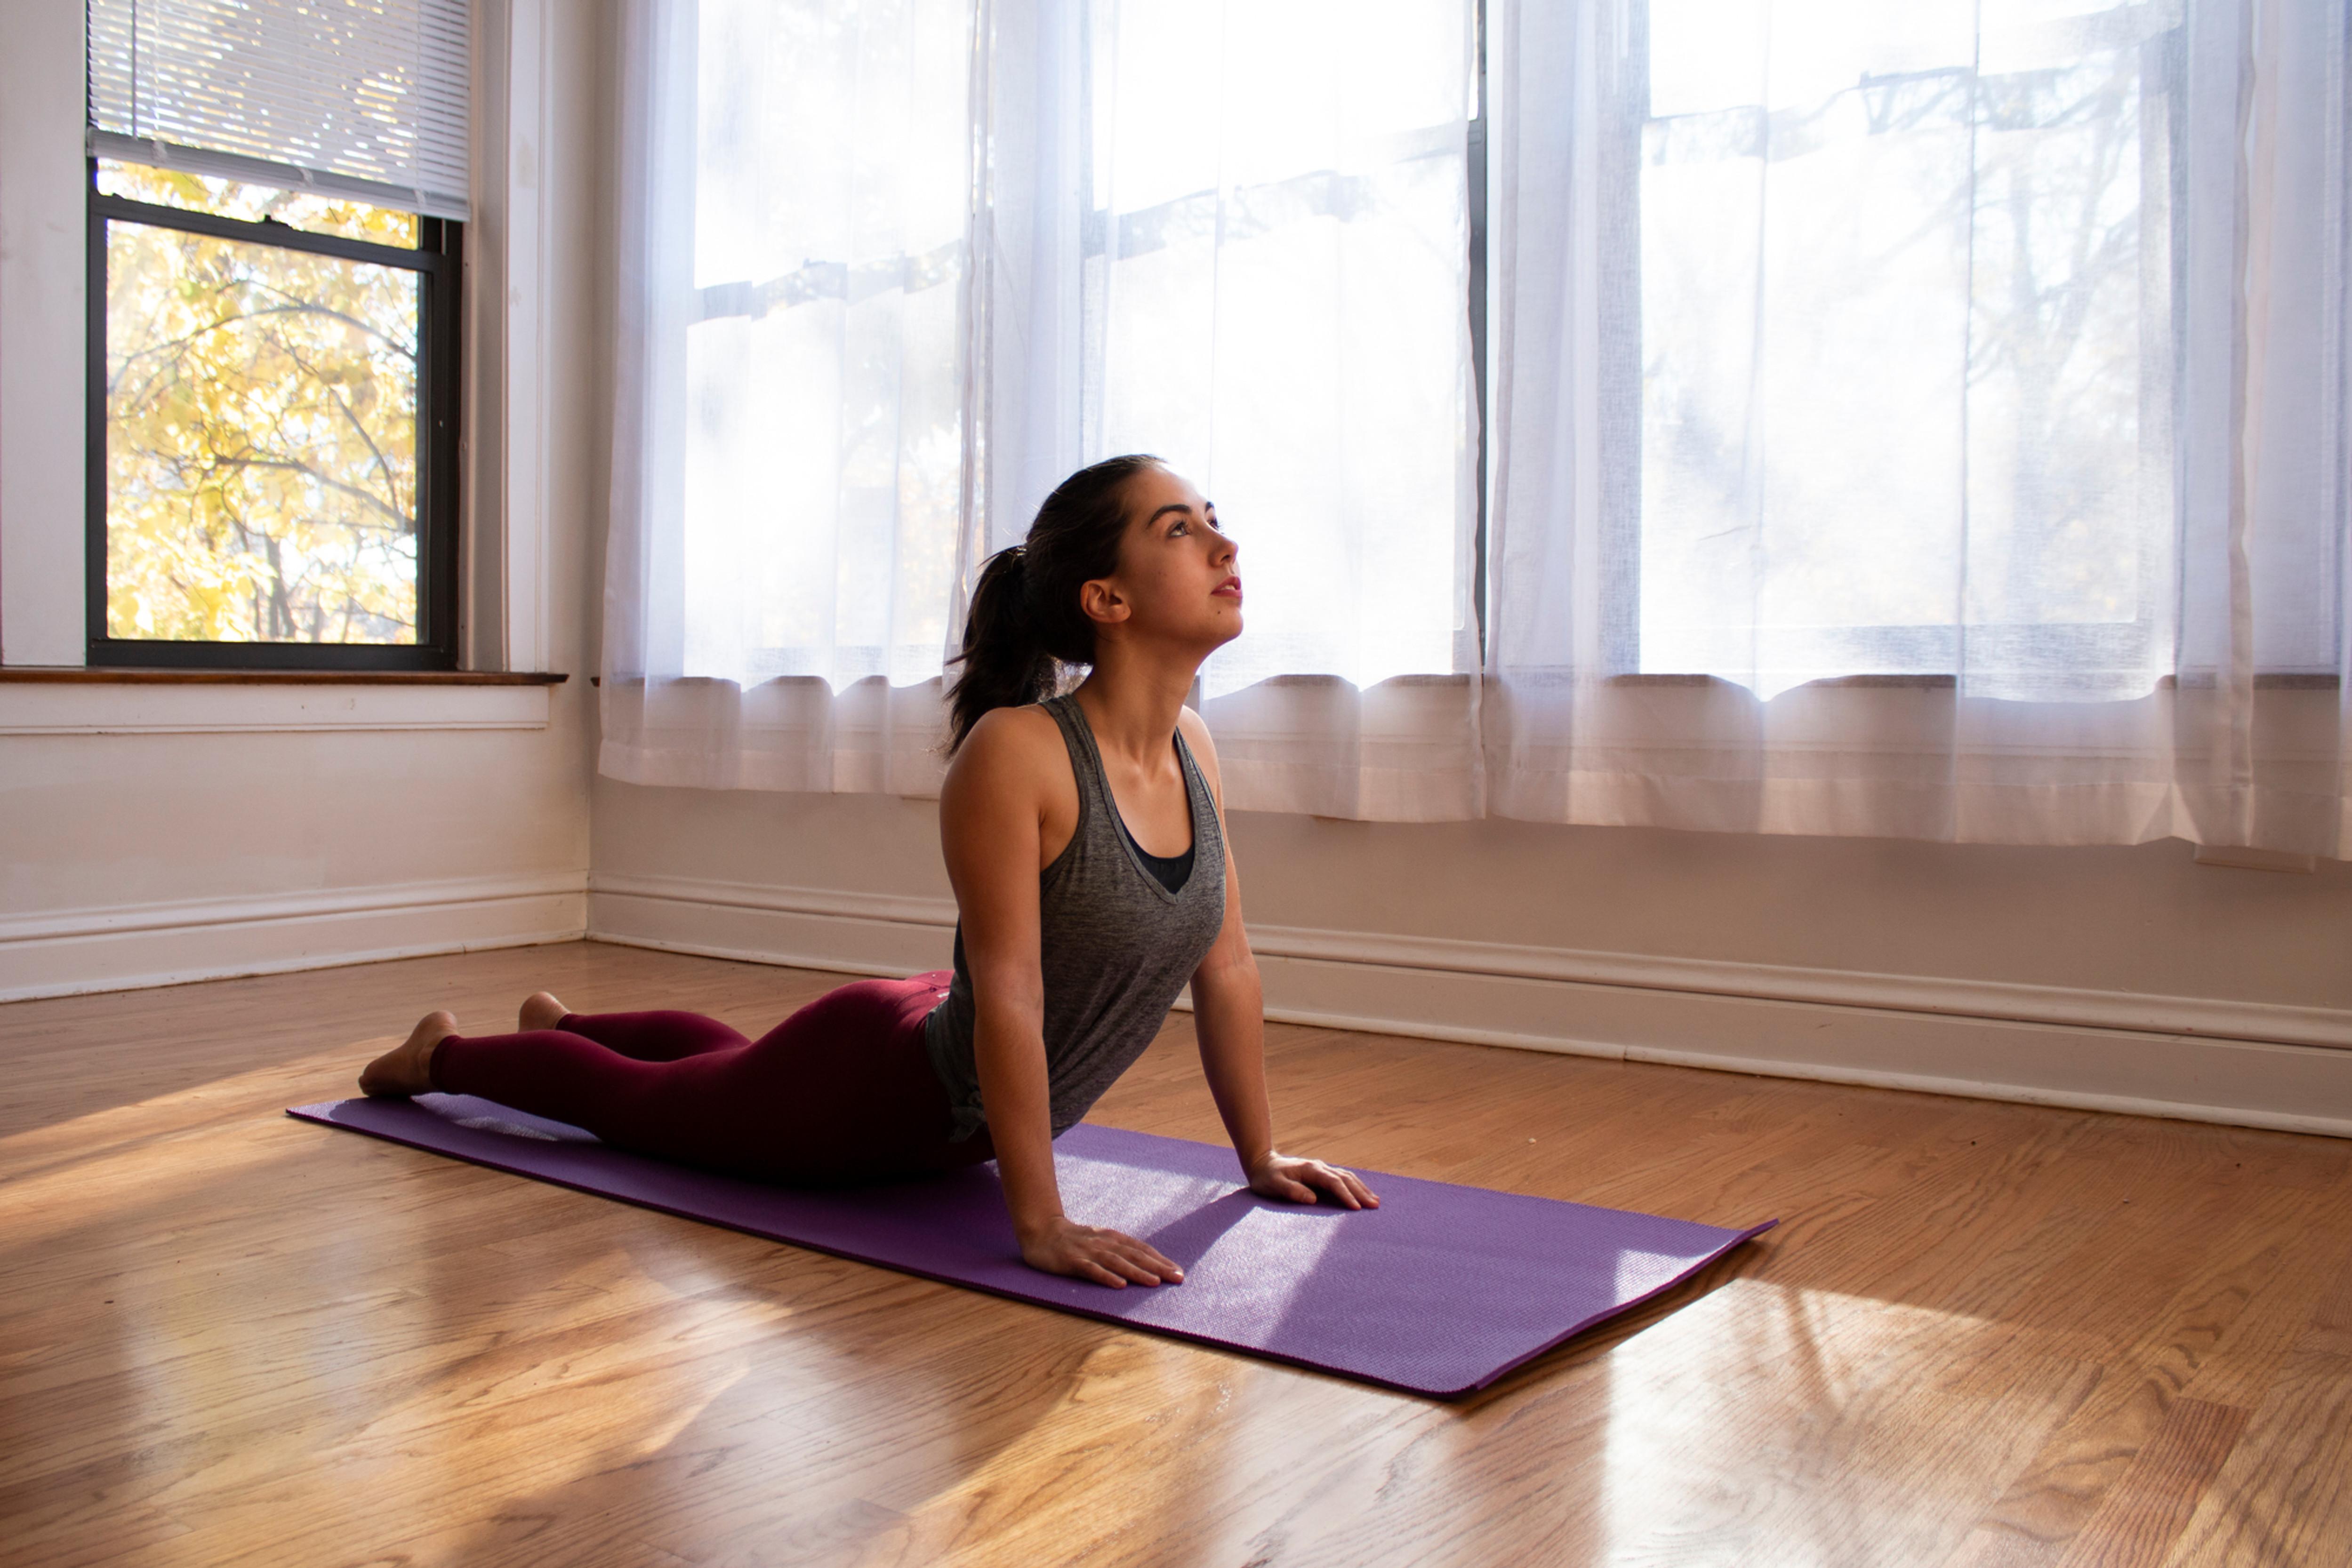 Private Yoga Class in Home